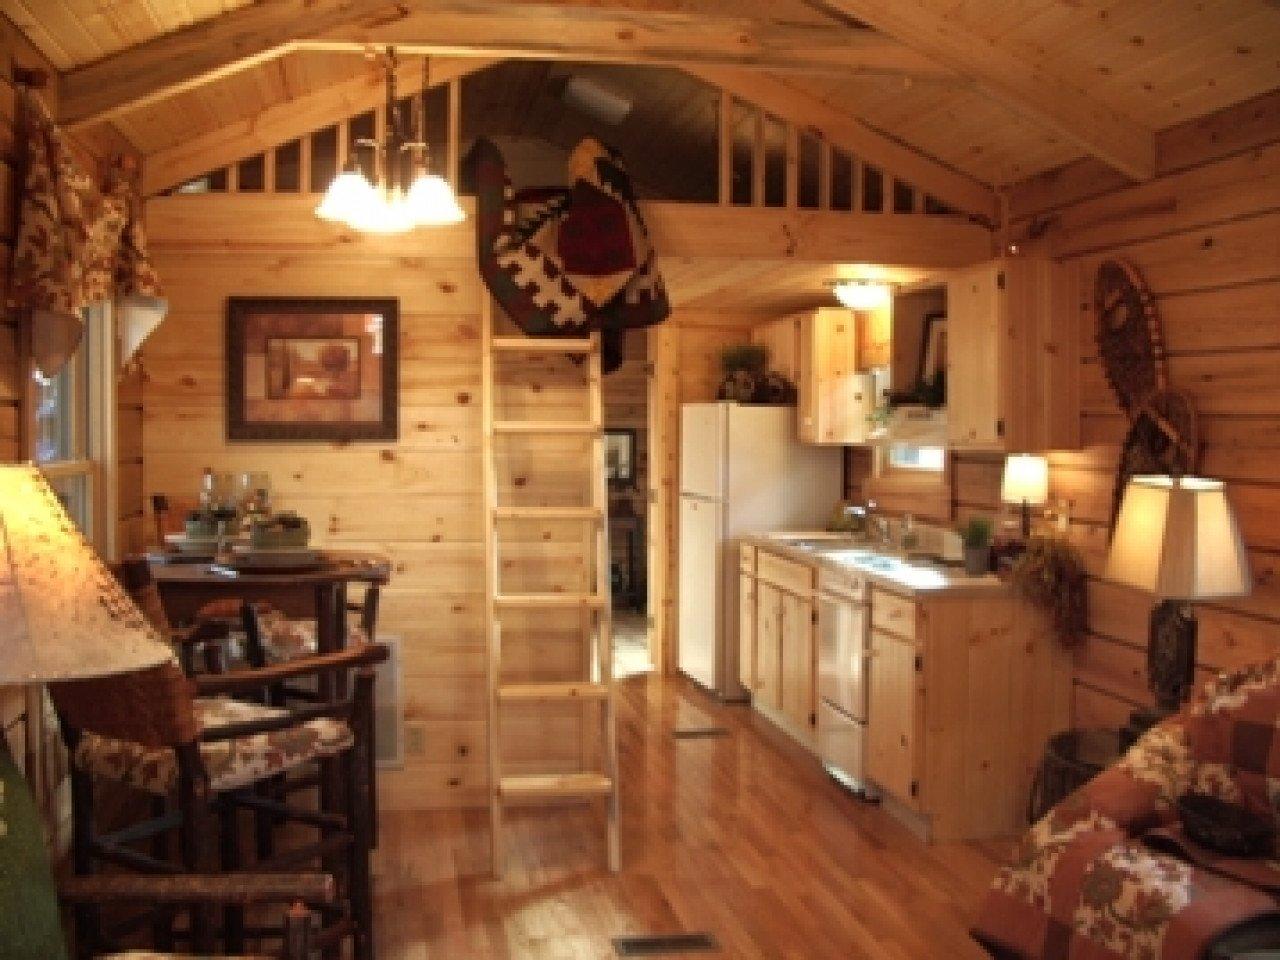 10 Most Popular Log Cabin Interior Design Ideas 10 unique picture small cabin interior design ideas new ideas 2020